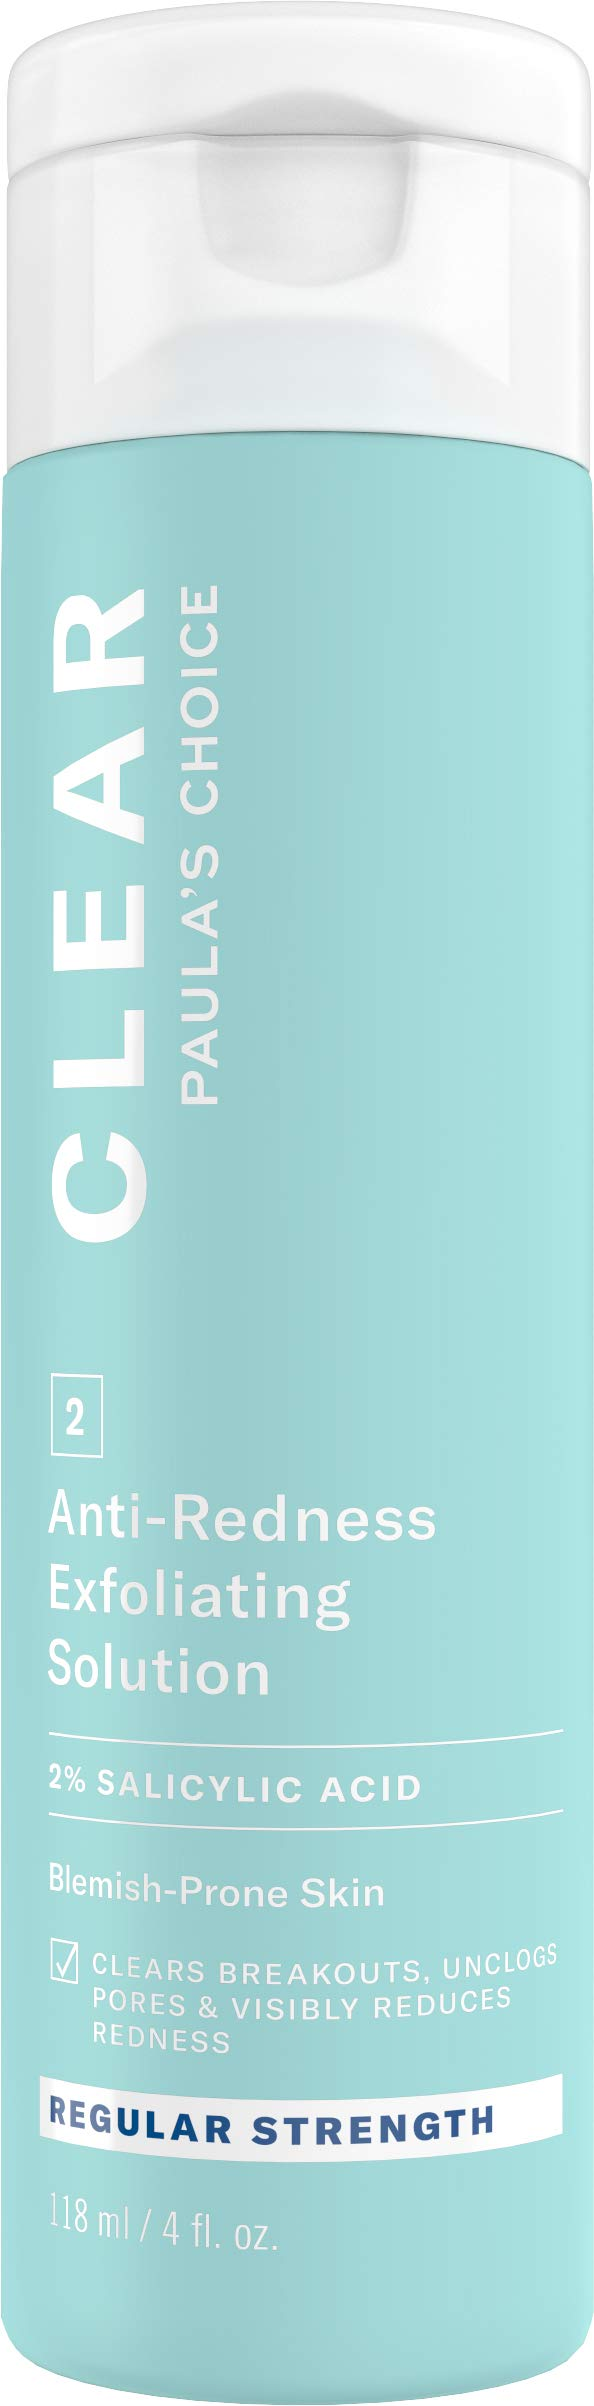 Paula's Choice CLEAR Regular Strength Exfoliator, 2% Salicylic Acid Exfoliant for Acne, Redness Relief, 4 Ounce by PAULA'S CHOICE